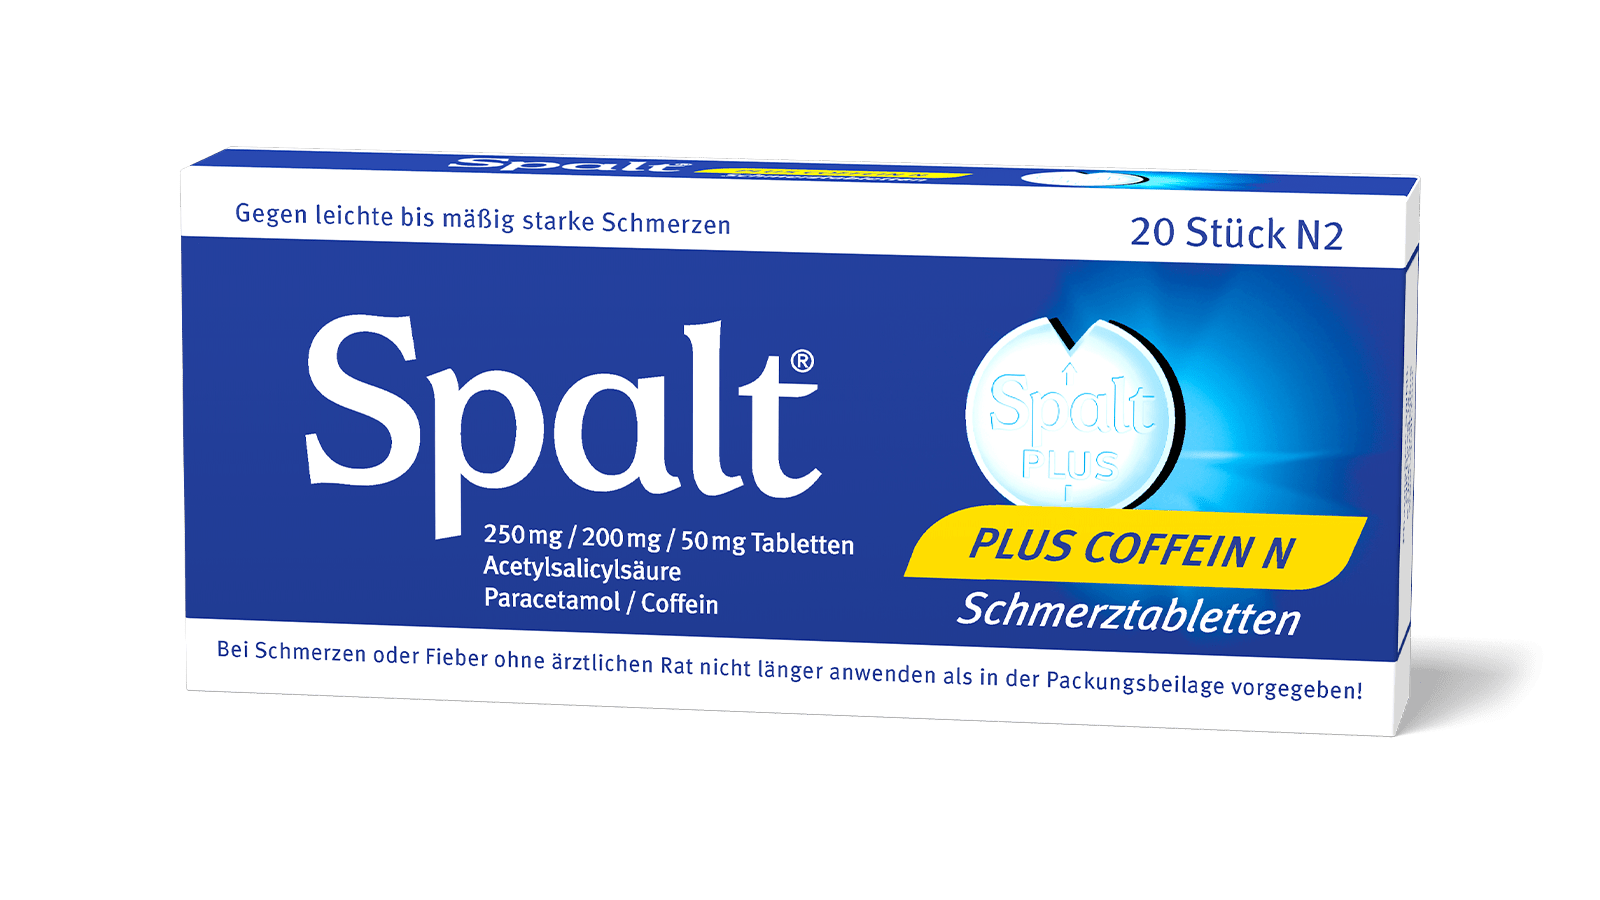 packshot spalt pluscoffein fs20 1600x900px